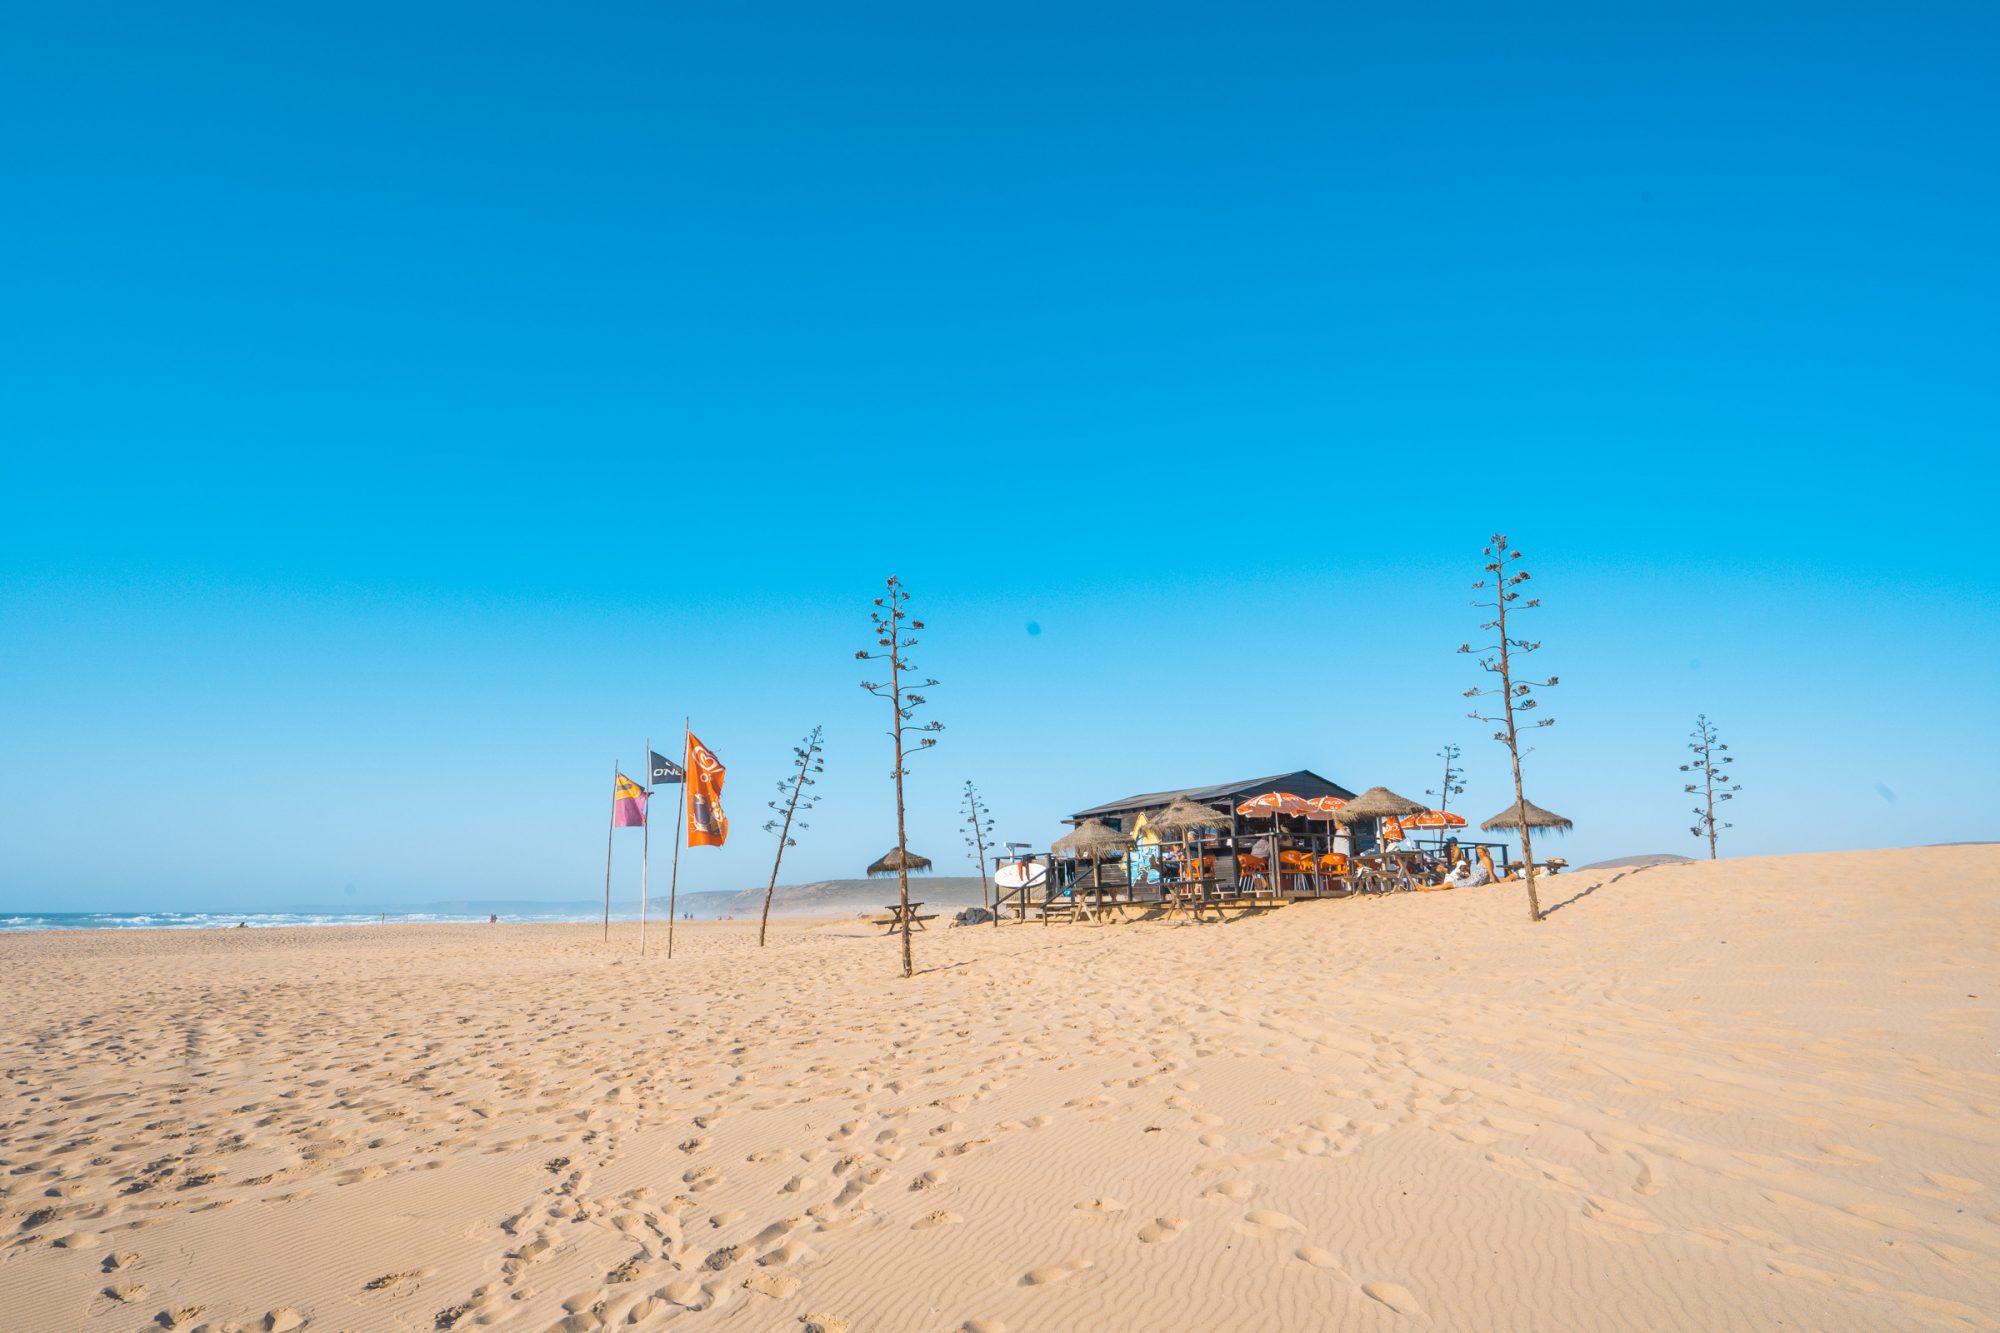 Praia da Bordeira, Algarve Tipps, schönsten Strände in Portugal, Strandbar